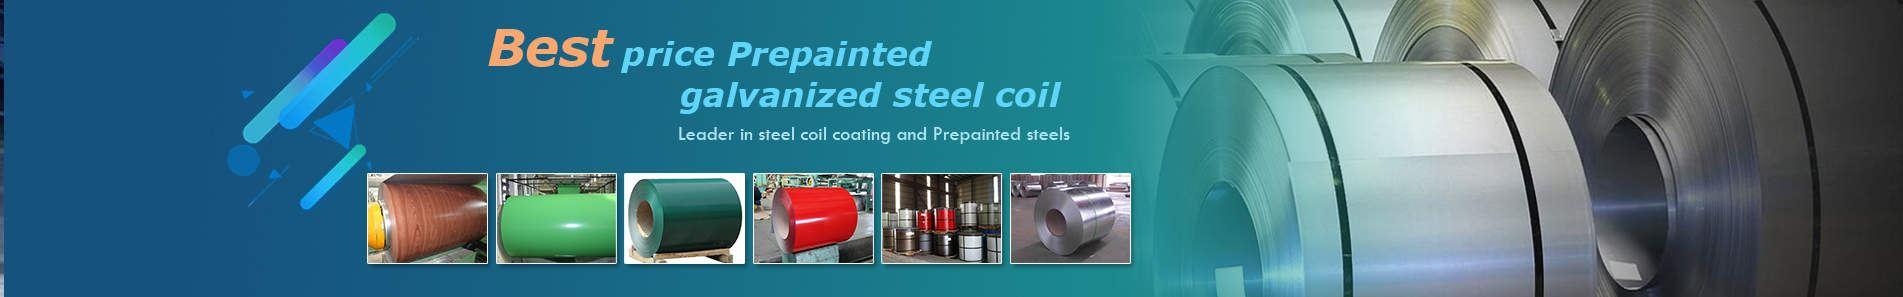 ppgl-steel-coil